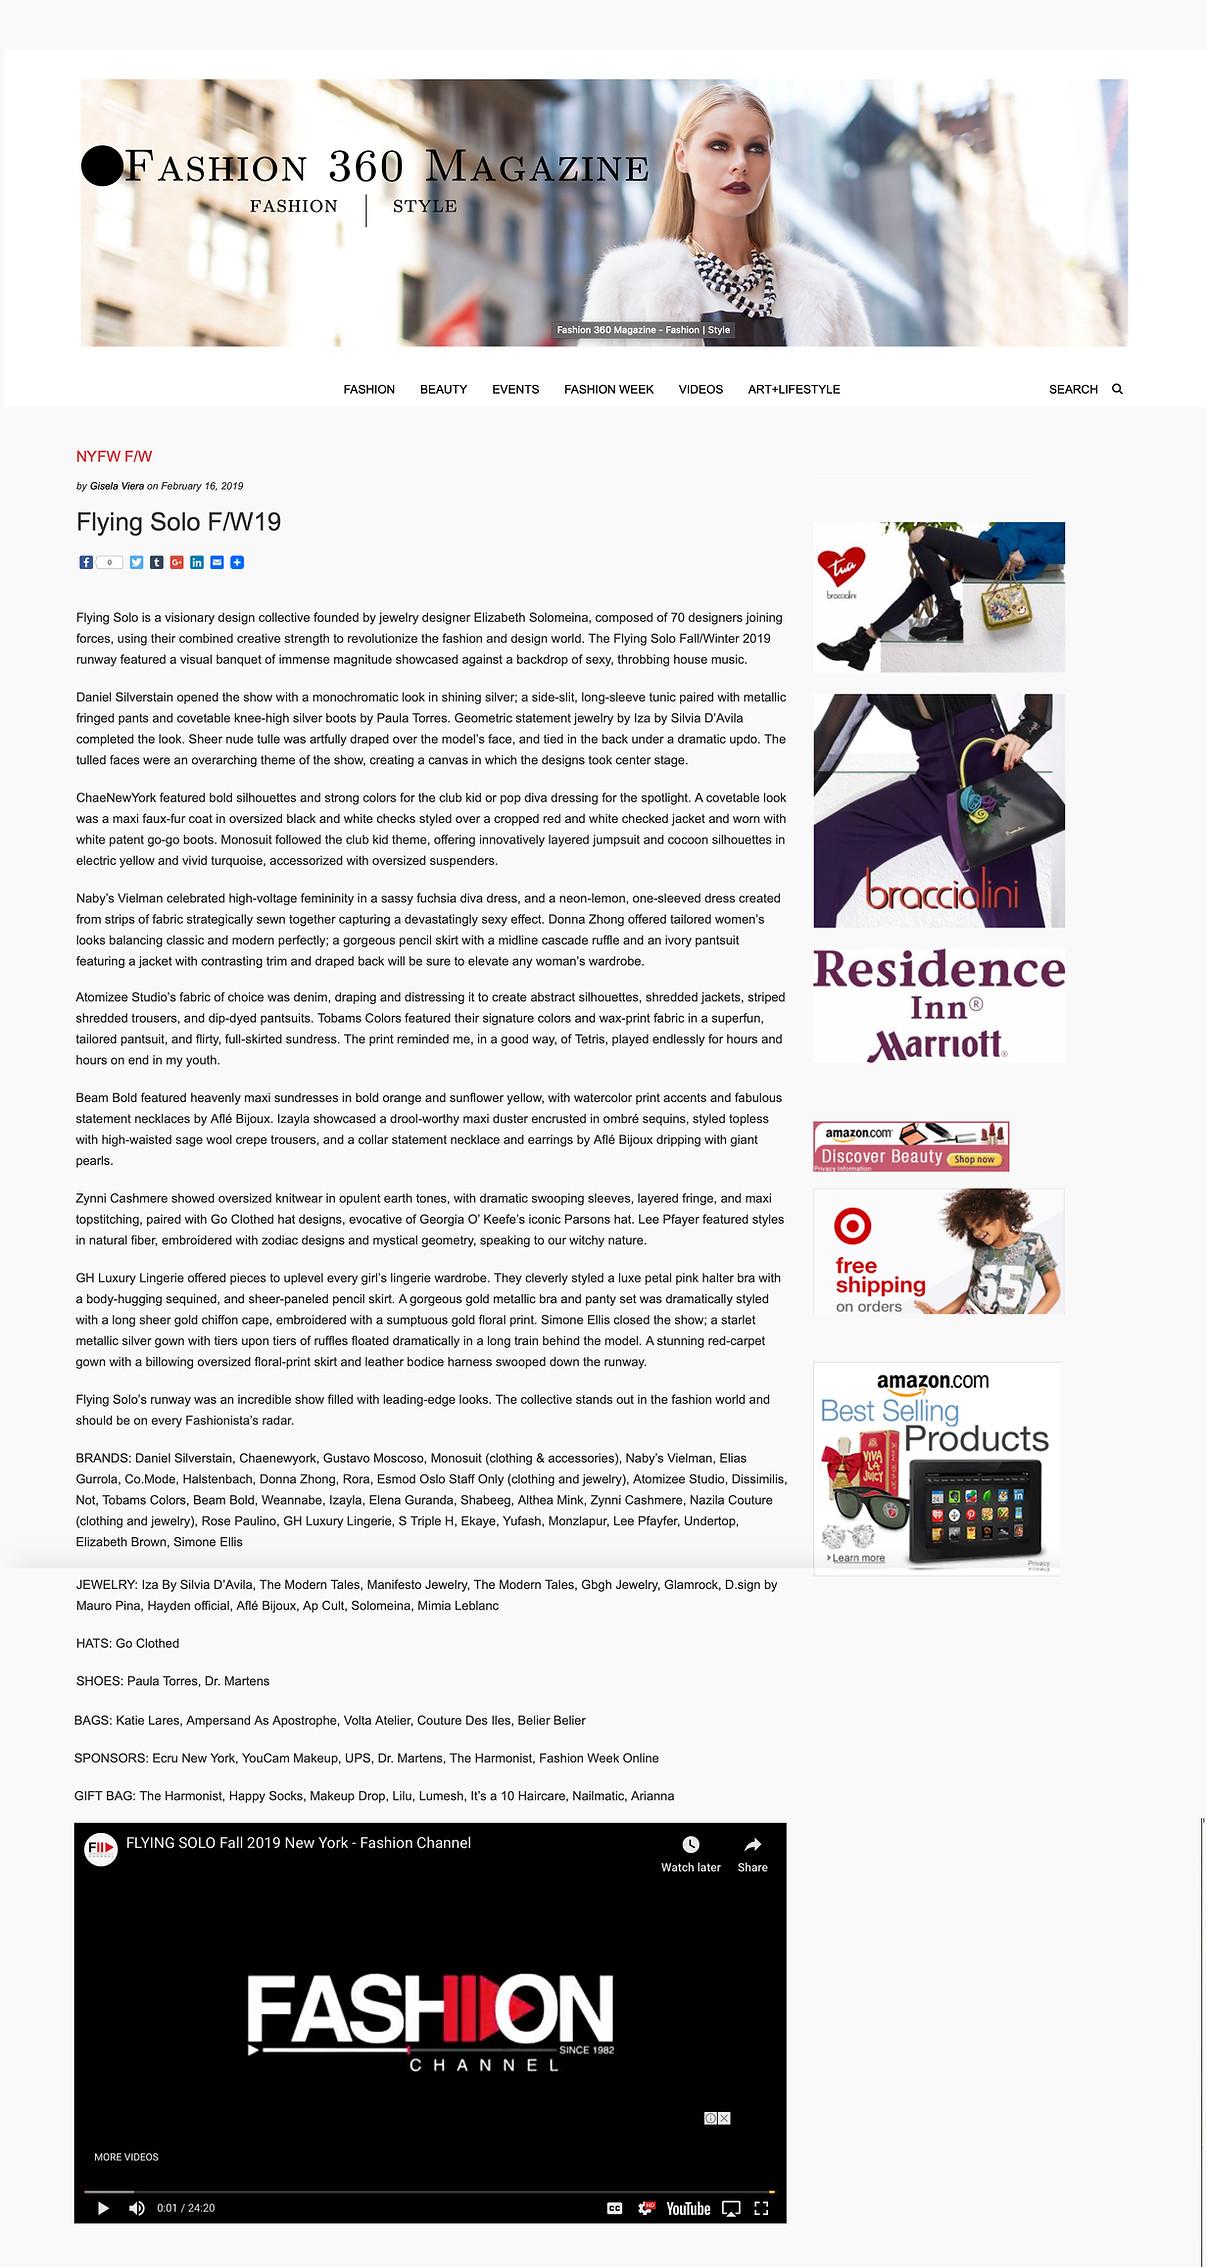 fashion 360 magazine.jpg